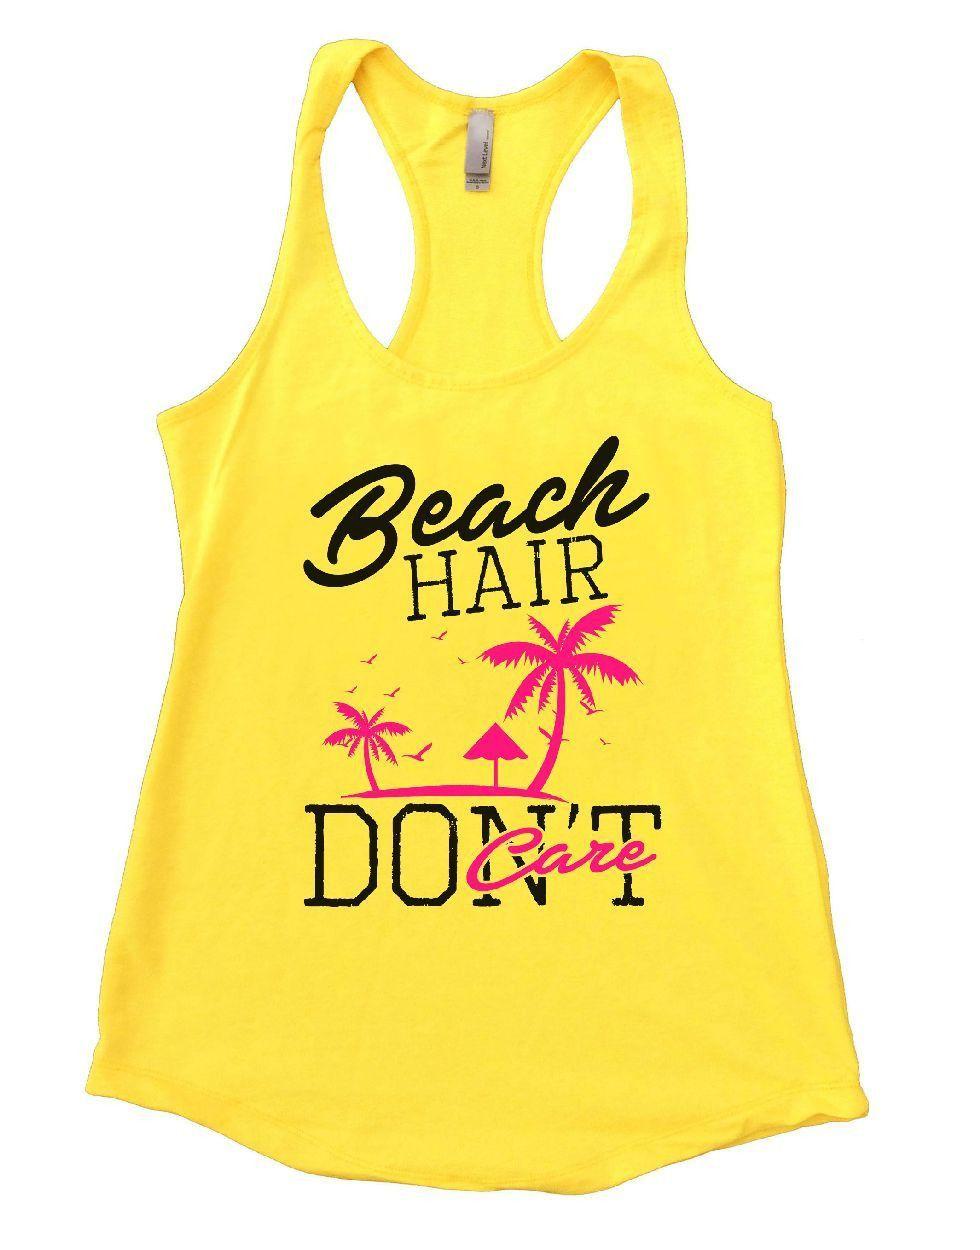 Beach HAIR DON'T Care Womens Workout Tank Top